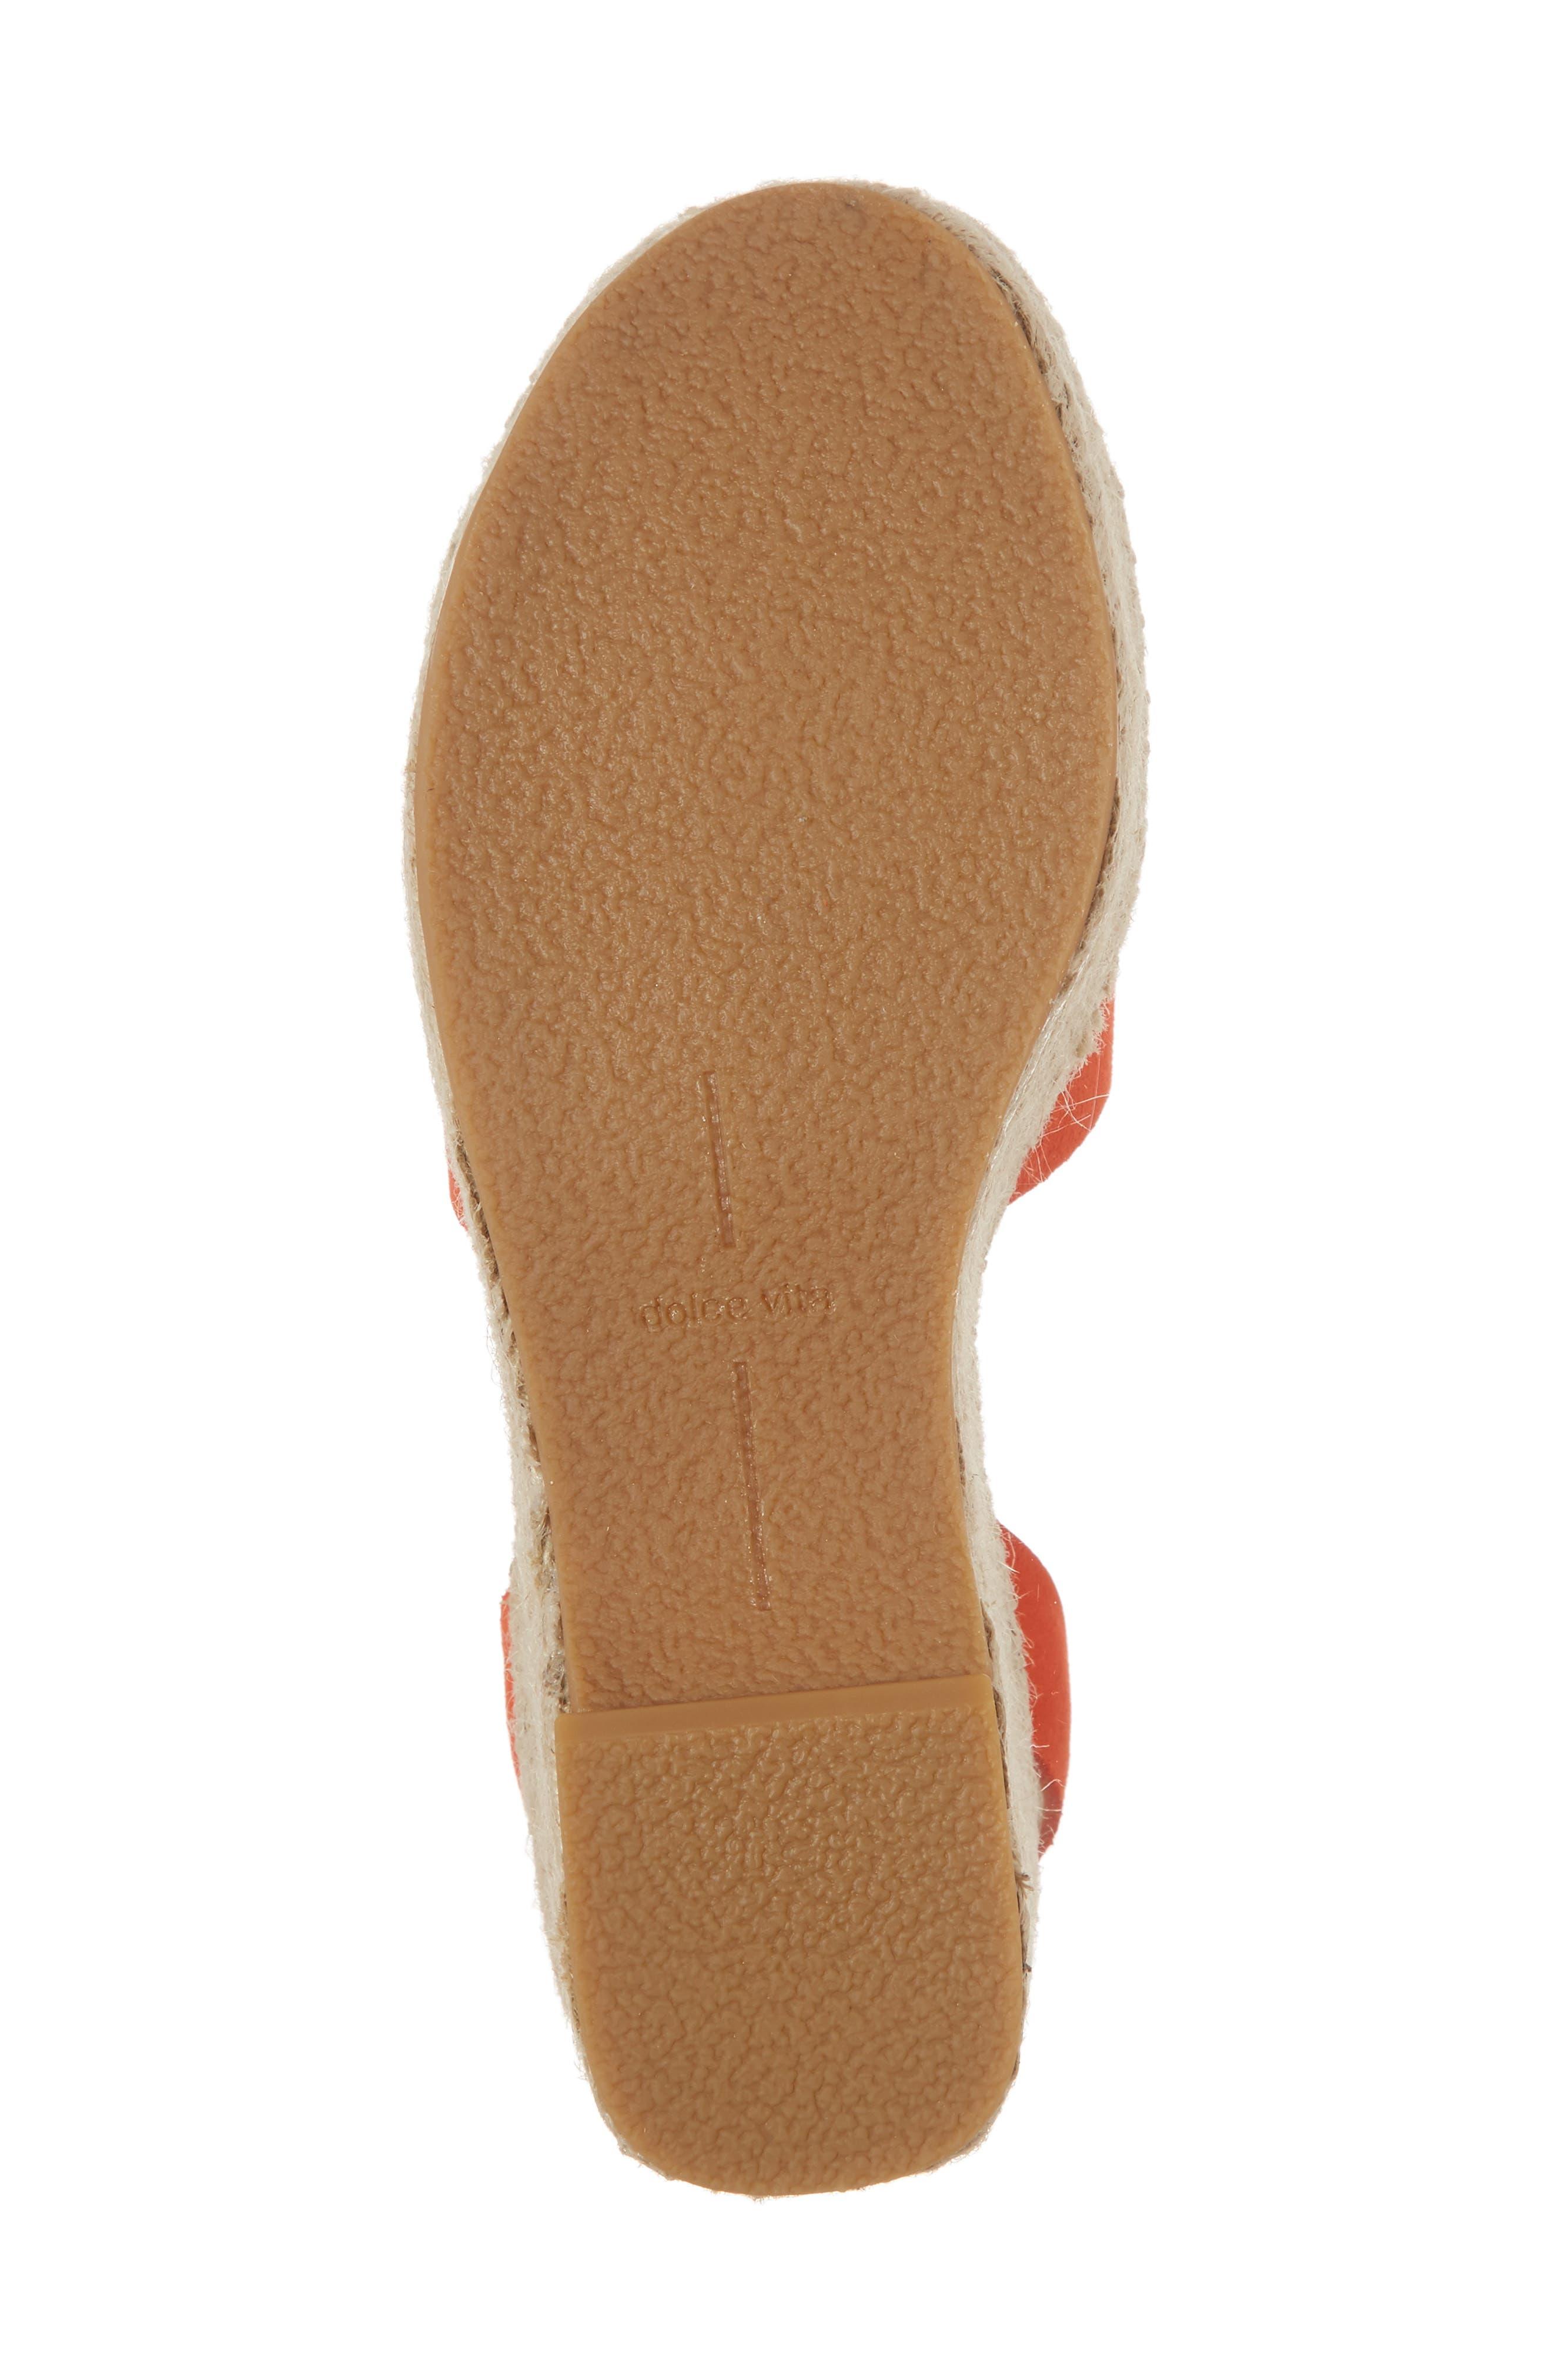 Lesly Espadrille Platform Sandal,                             Alternate thumbnail 41, color,